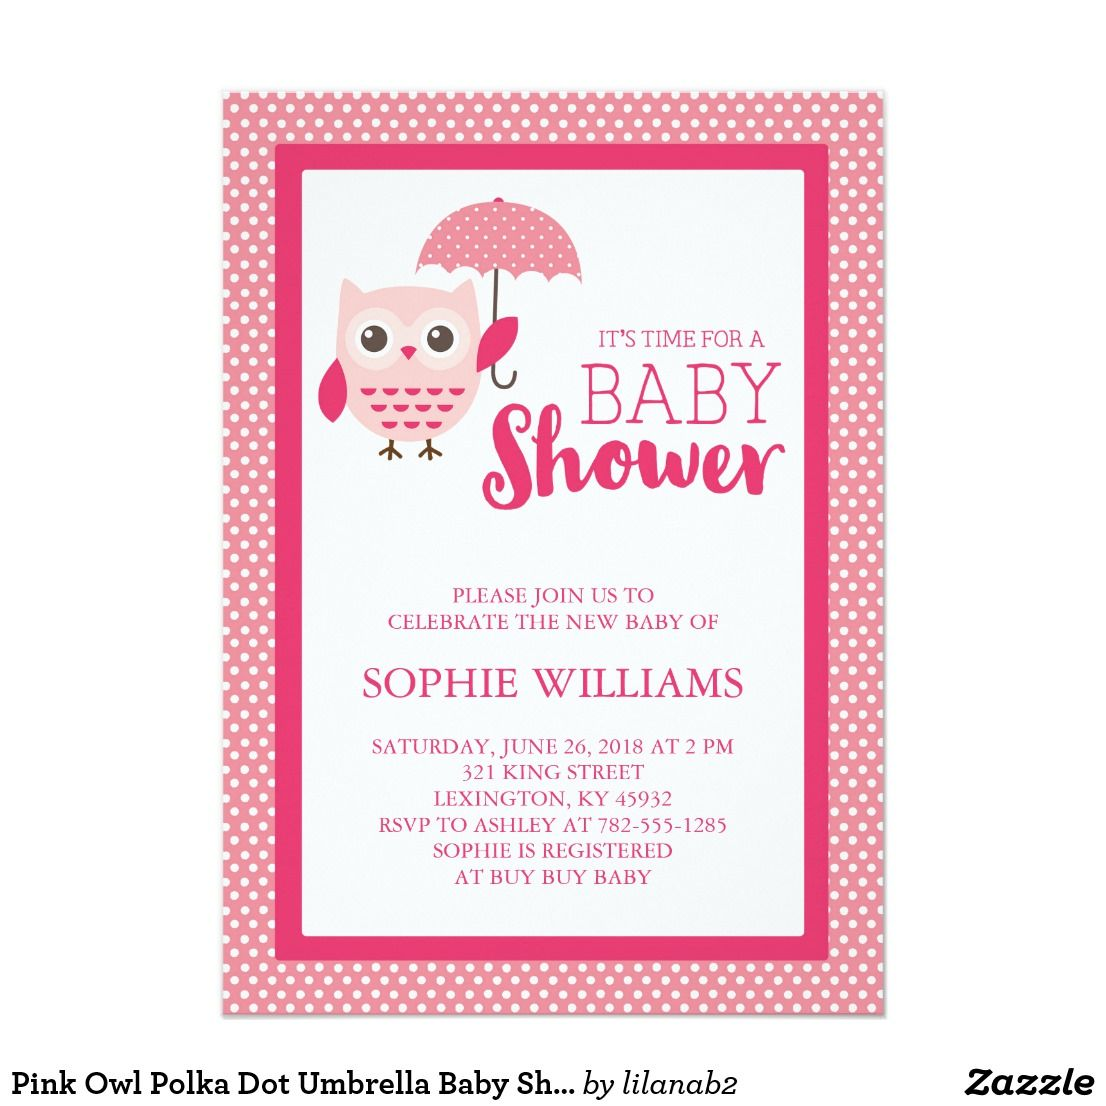 Pink Owl Polka Dot Umbrella Baby Shower Card   Umbrella baby ...